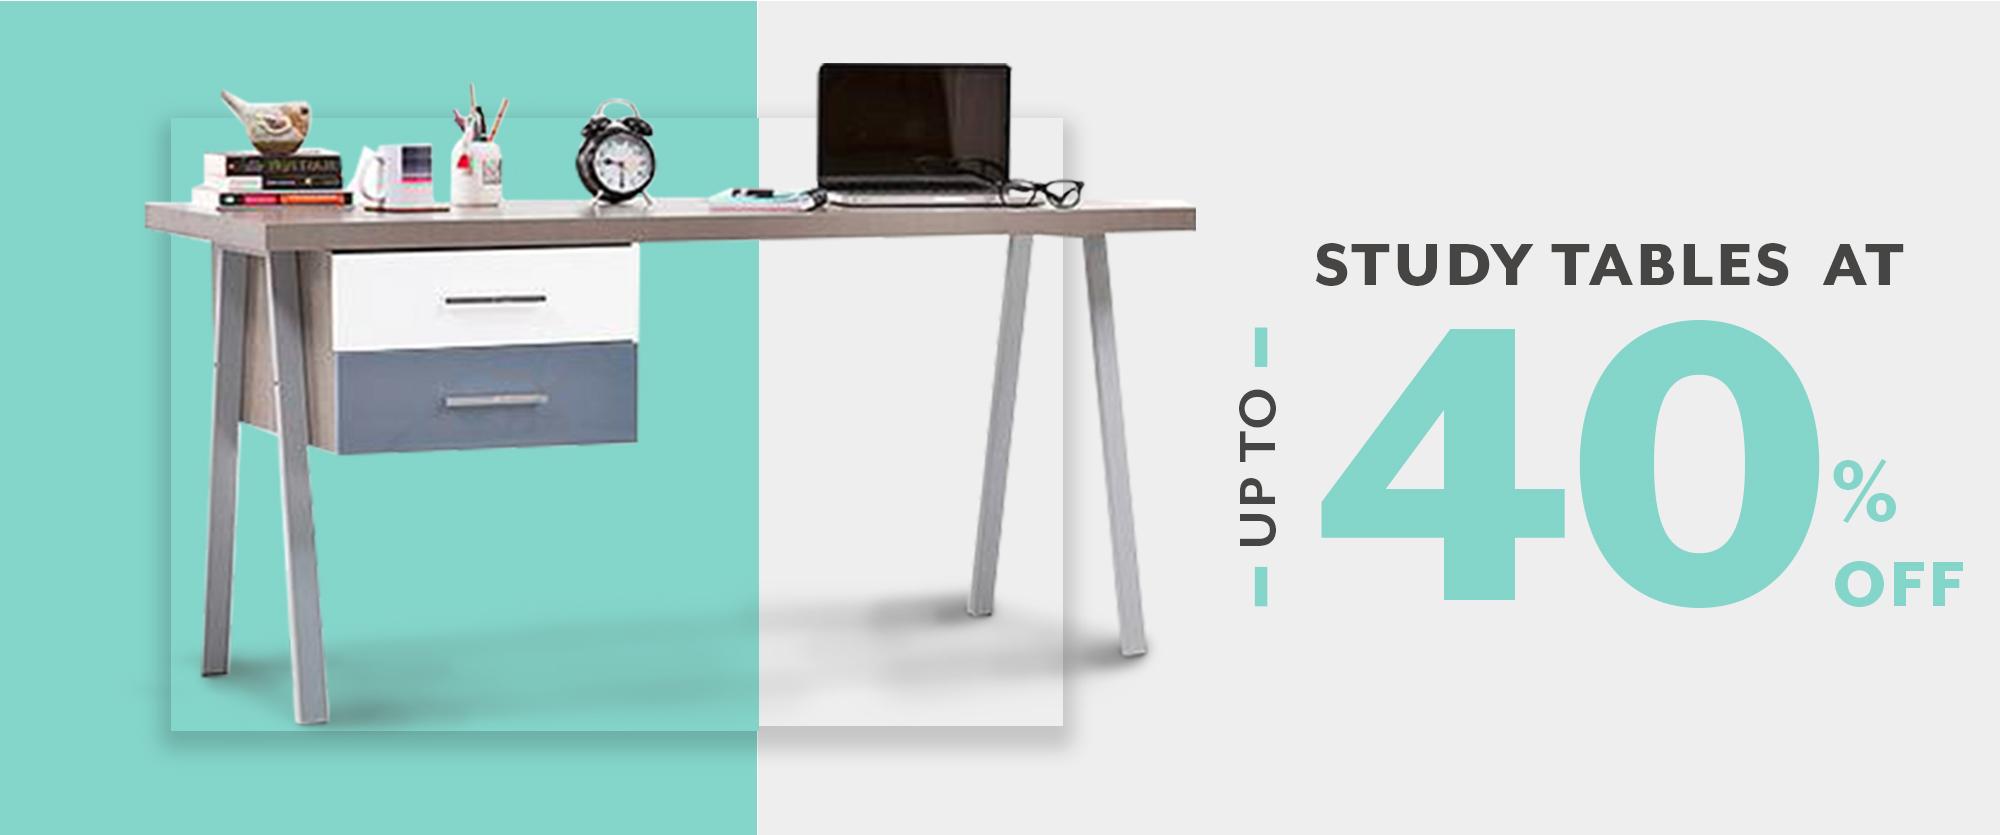 Ssm june 2021 landing pagedesk   study tables